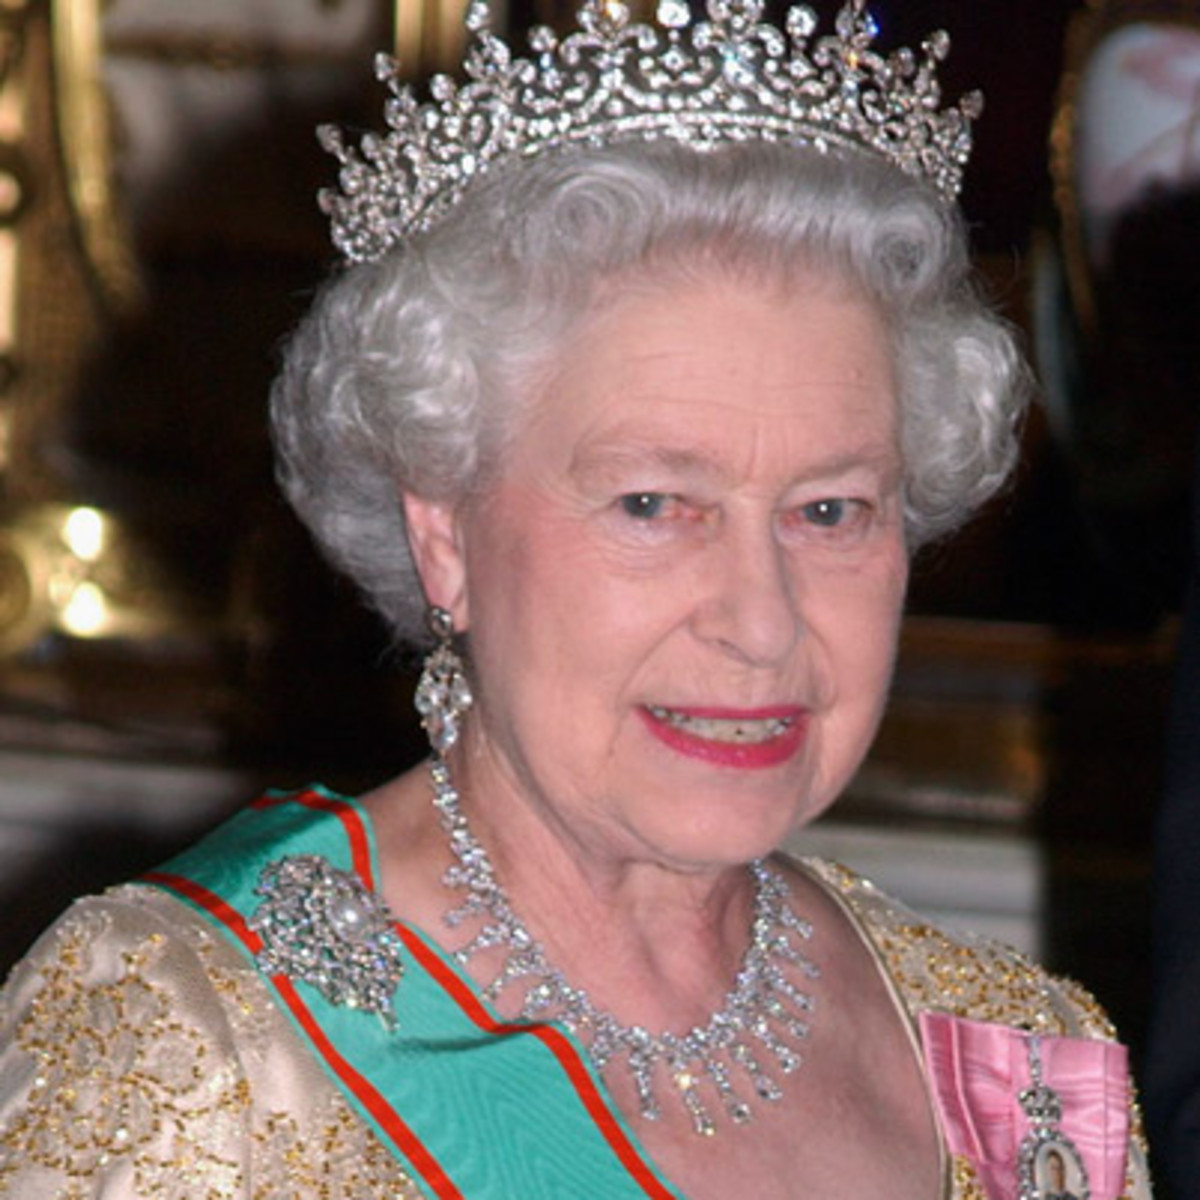 Queen Elizabeth Found Guilty in Missing Children Case  Queen Elizabeth...